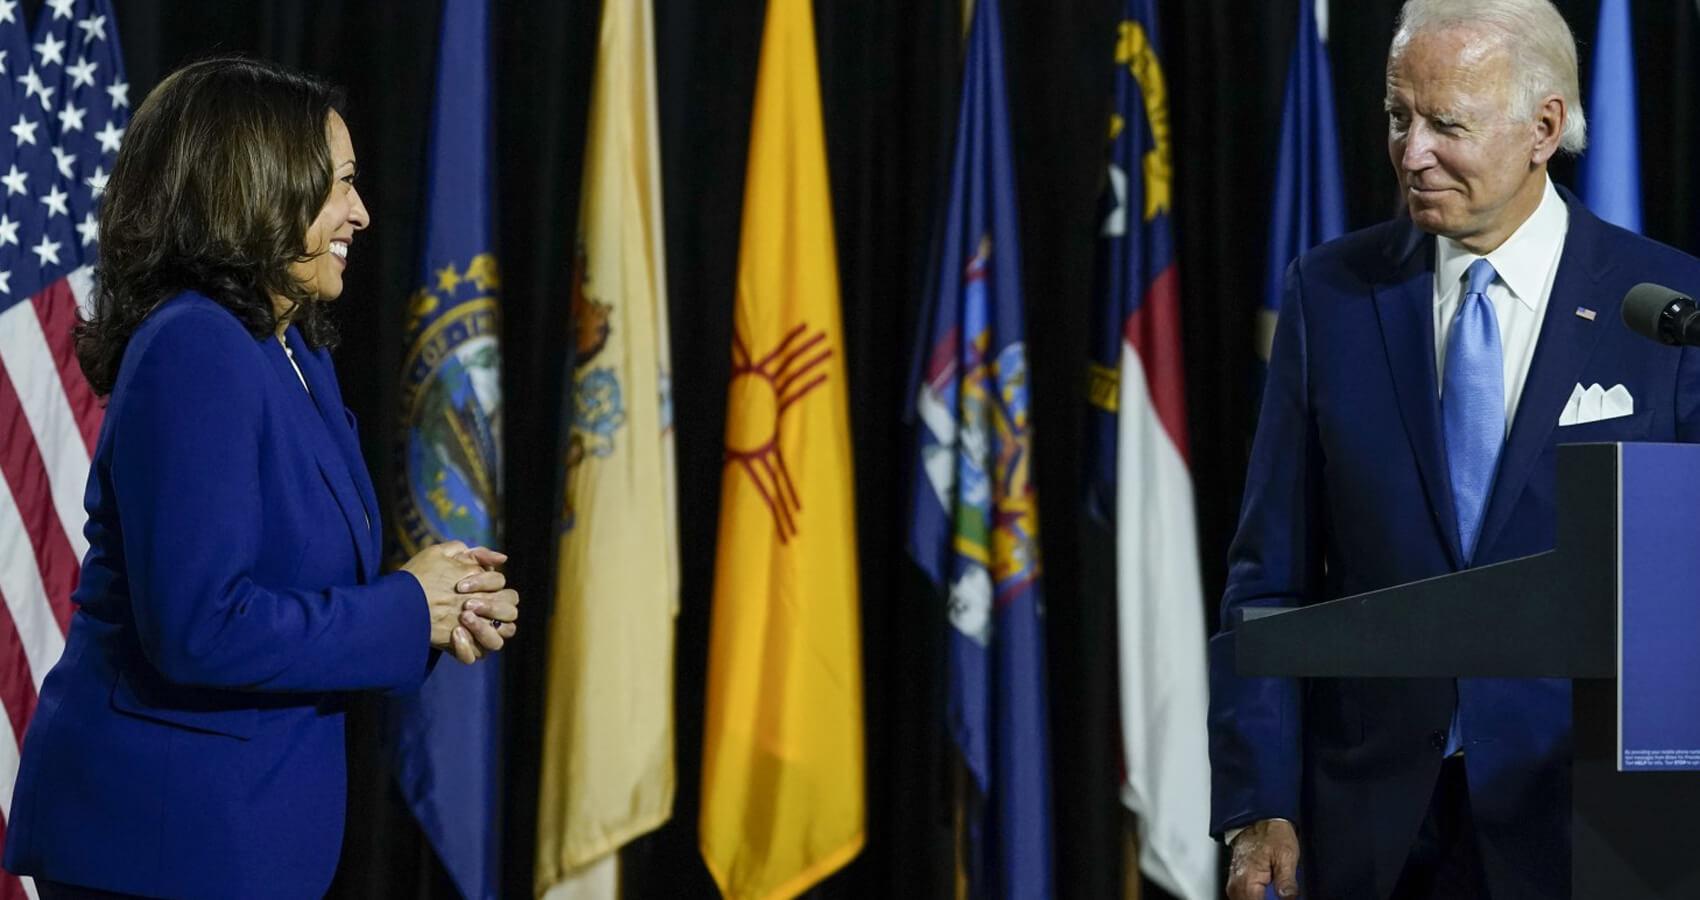 College of Electors Choose Biden-Harris As Next US President & Vice Prtesident